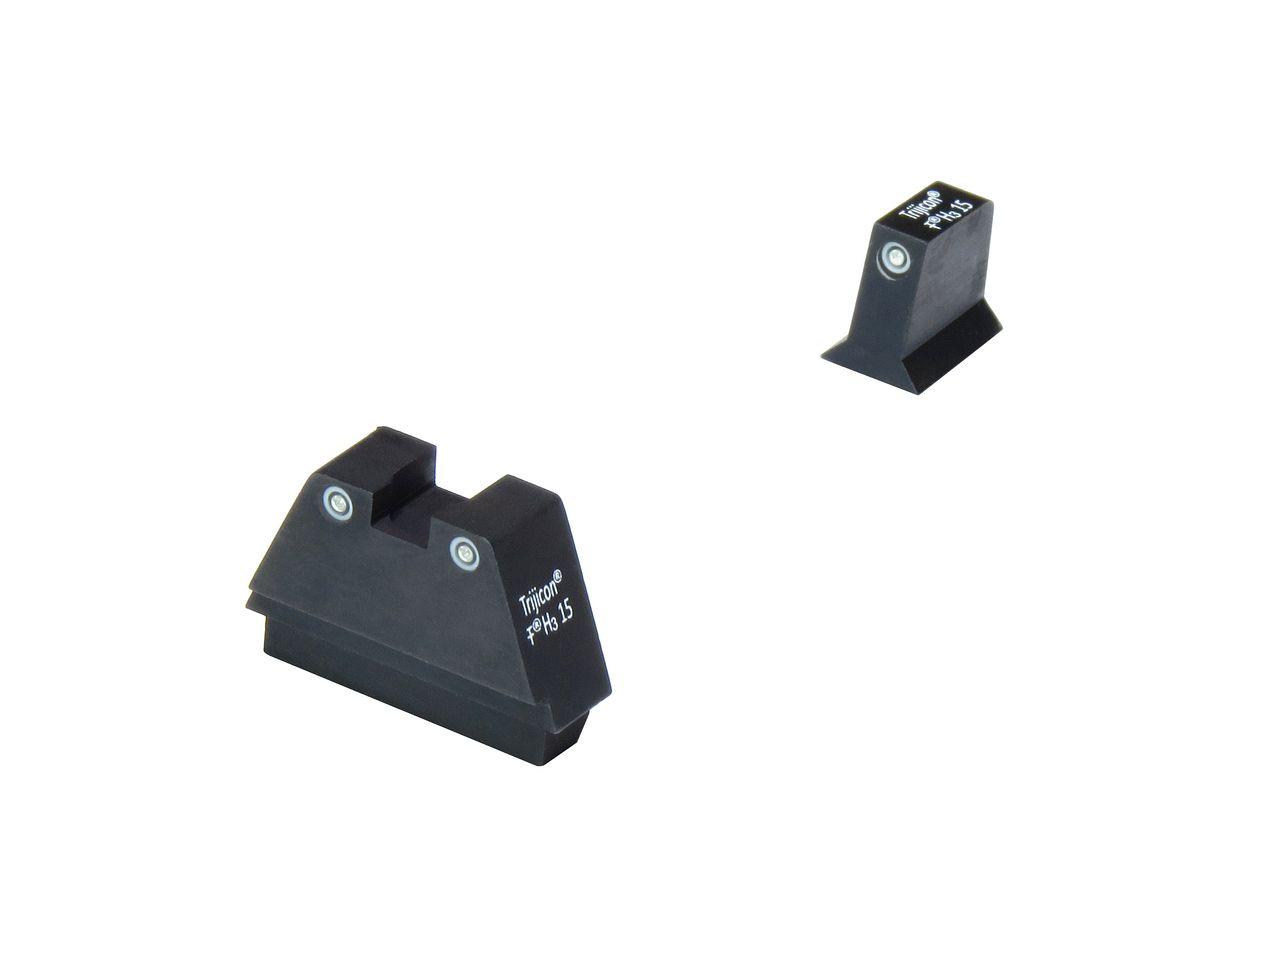 NorthEast Glock Silencer NightSights/トリチウムナイトサイト/High (マルイ/WE Glock用)